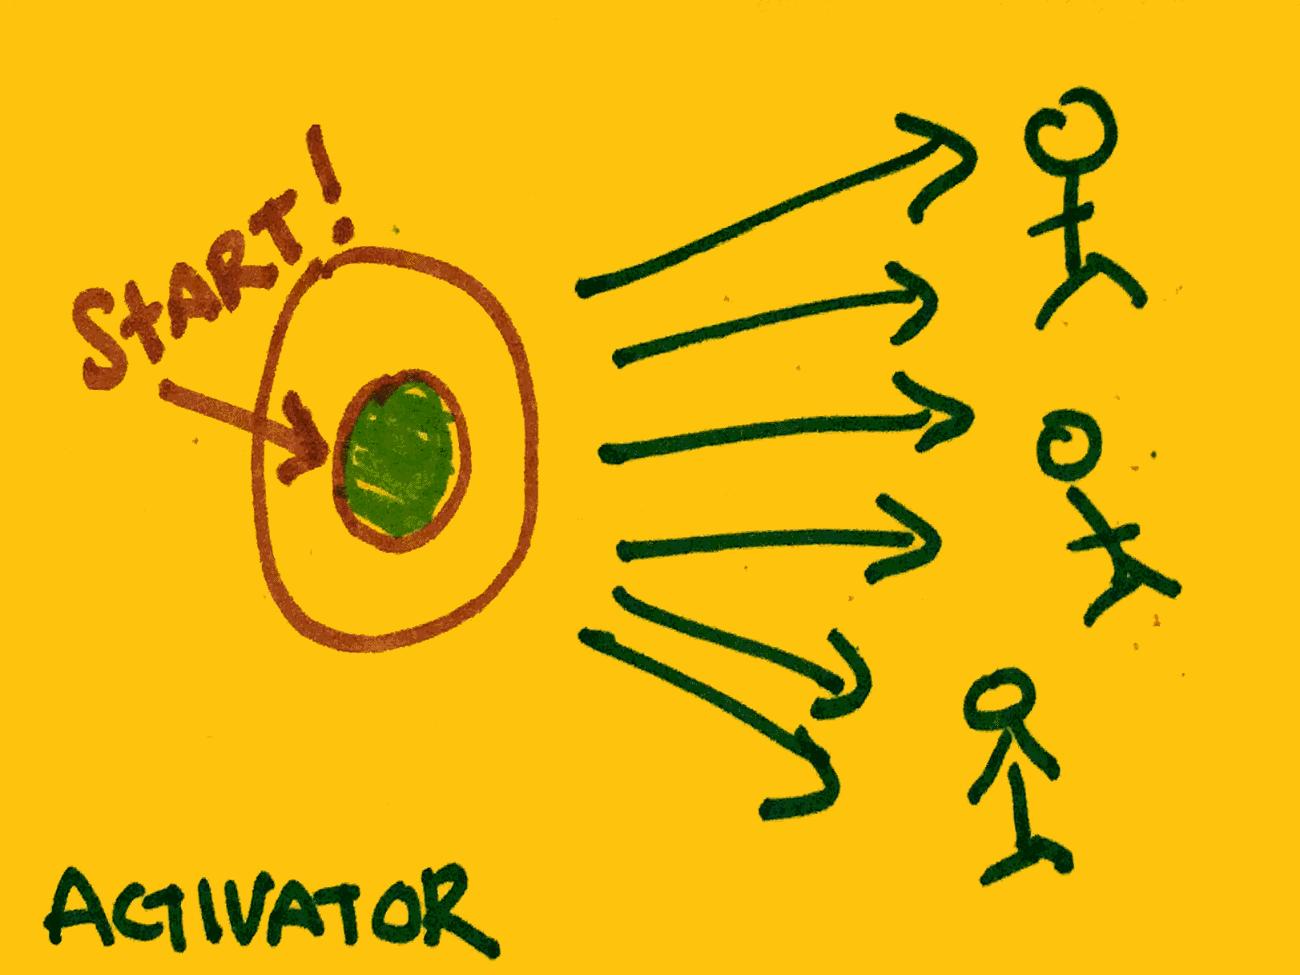 Activator Strengthsfinder Start to People